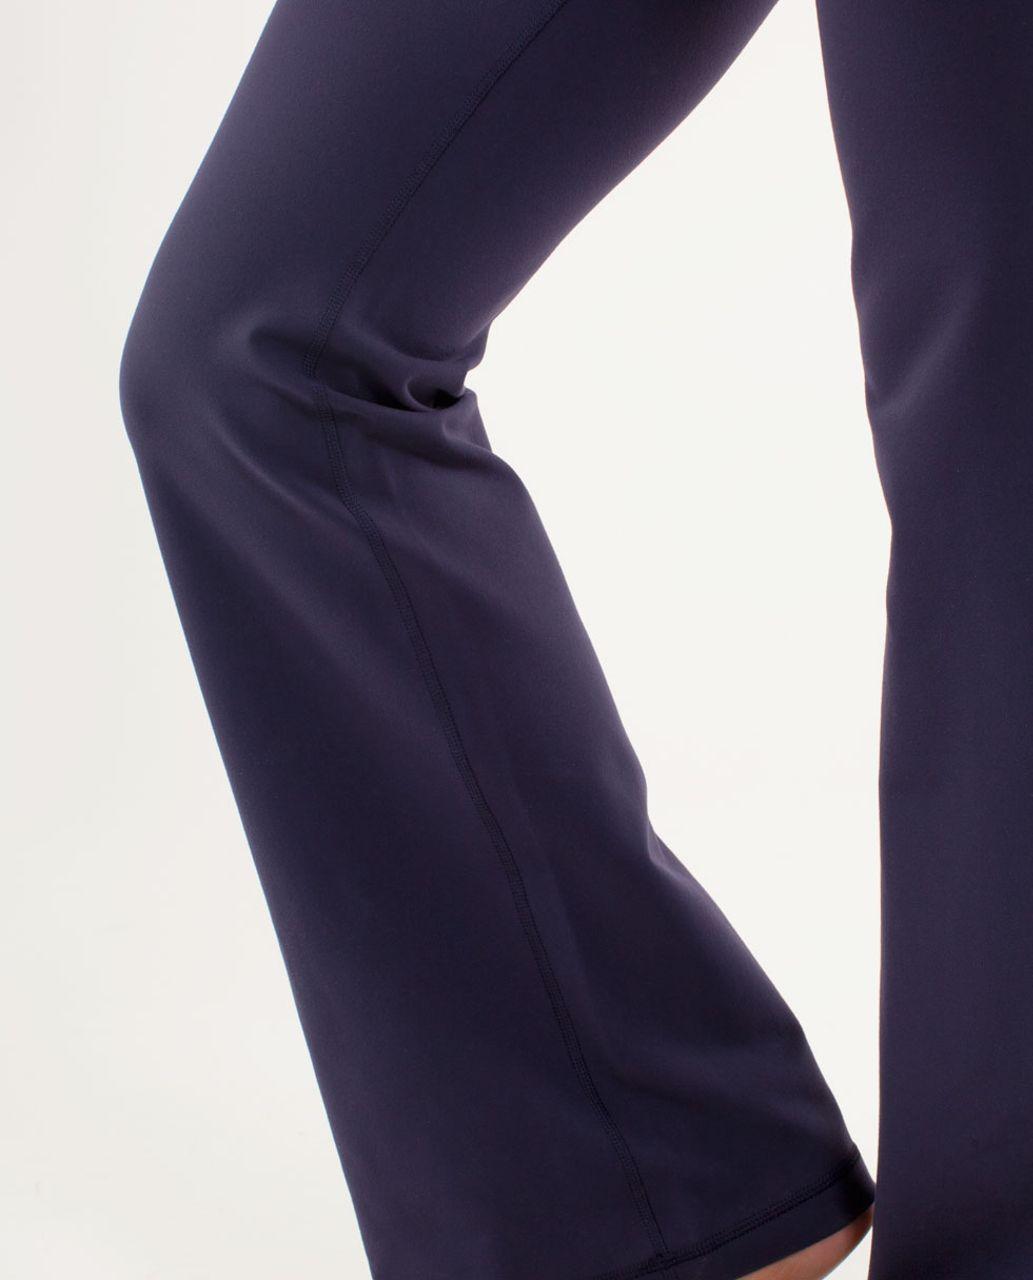 Lululemon Groove Pant (Tall) - Deep Indigo / Mirage Deep Indigo / White